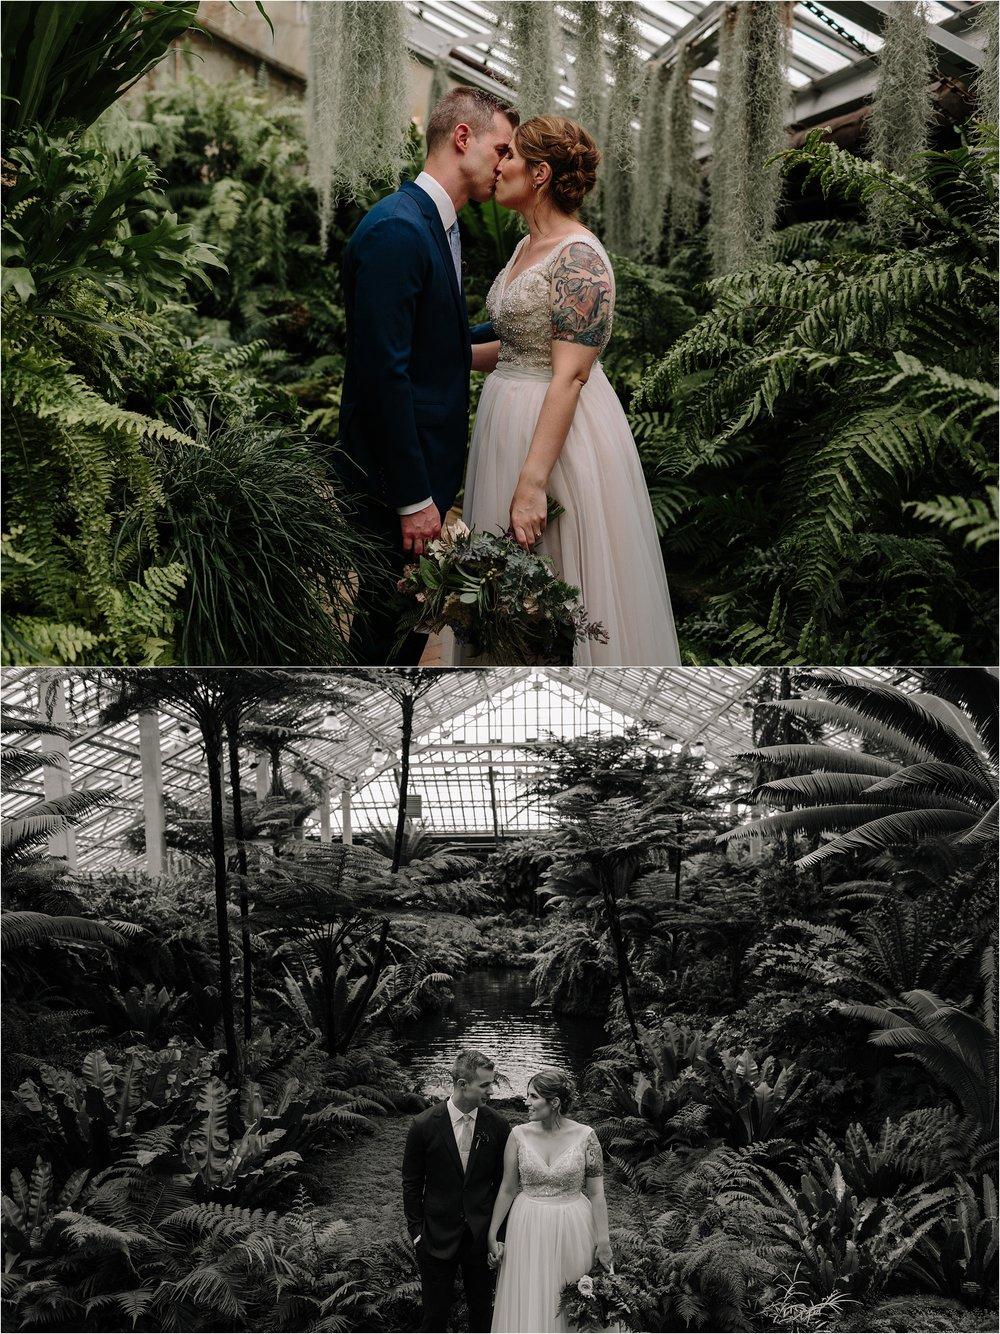 garfield-park-conservatory-wedding-105.jpg